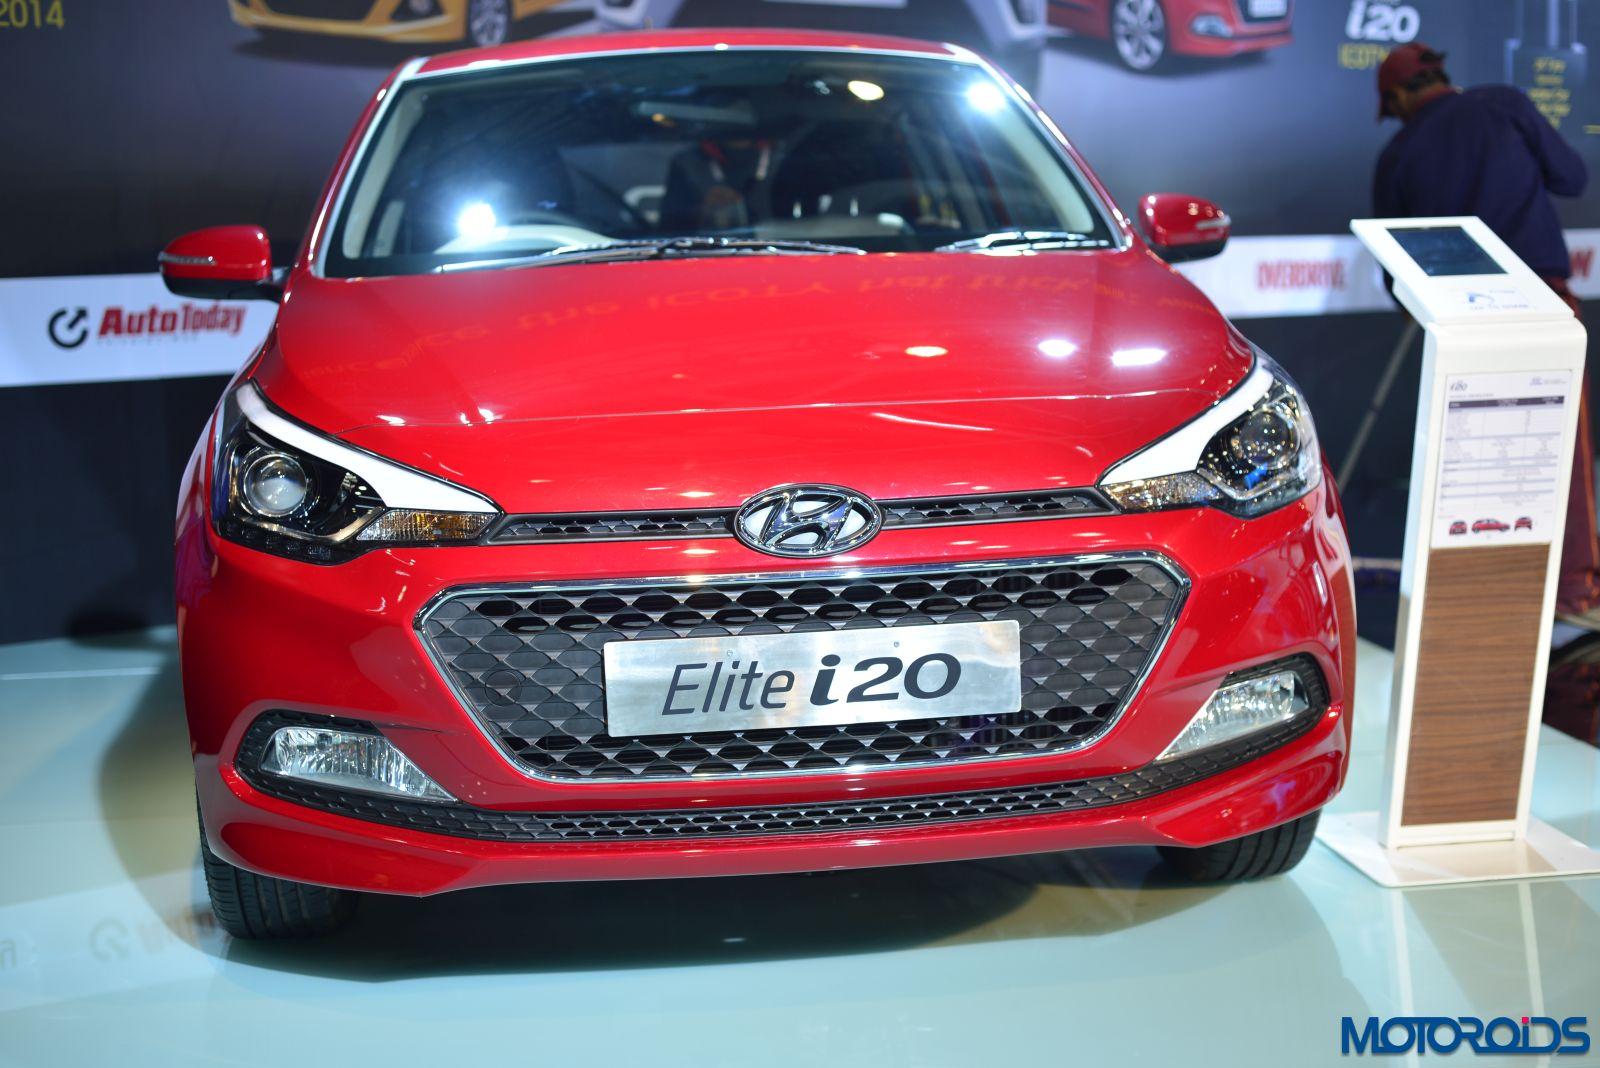 2016 Hyundai Elite i20 (1)